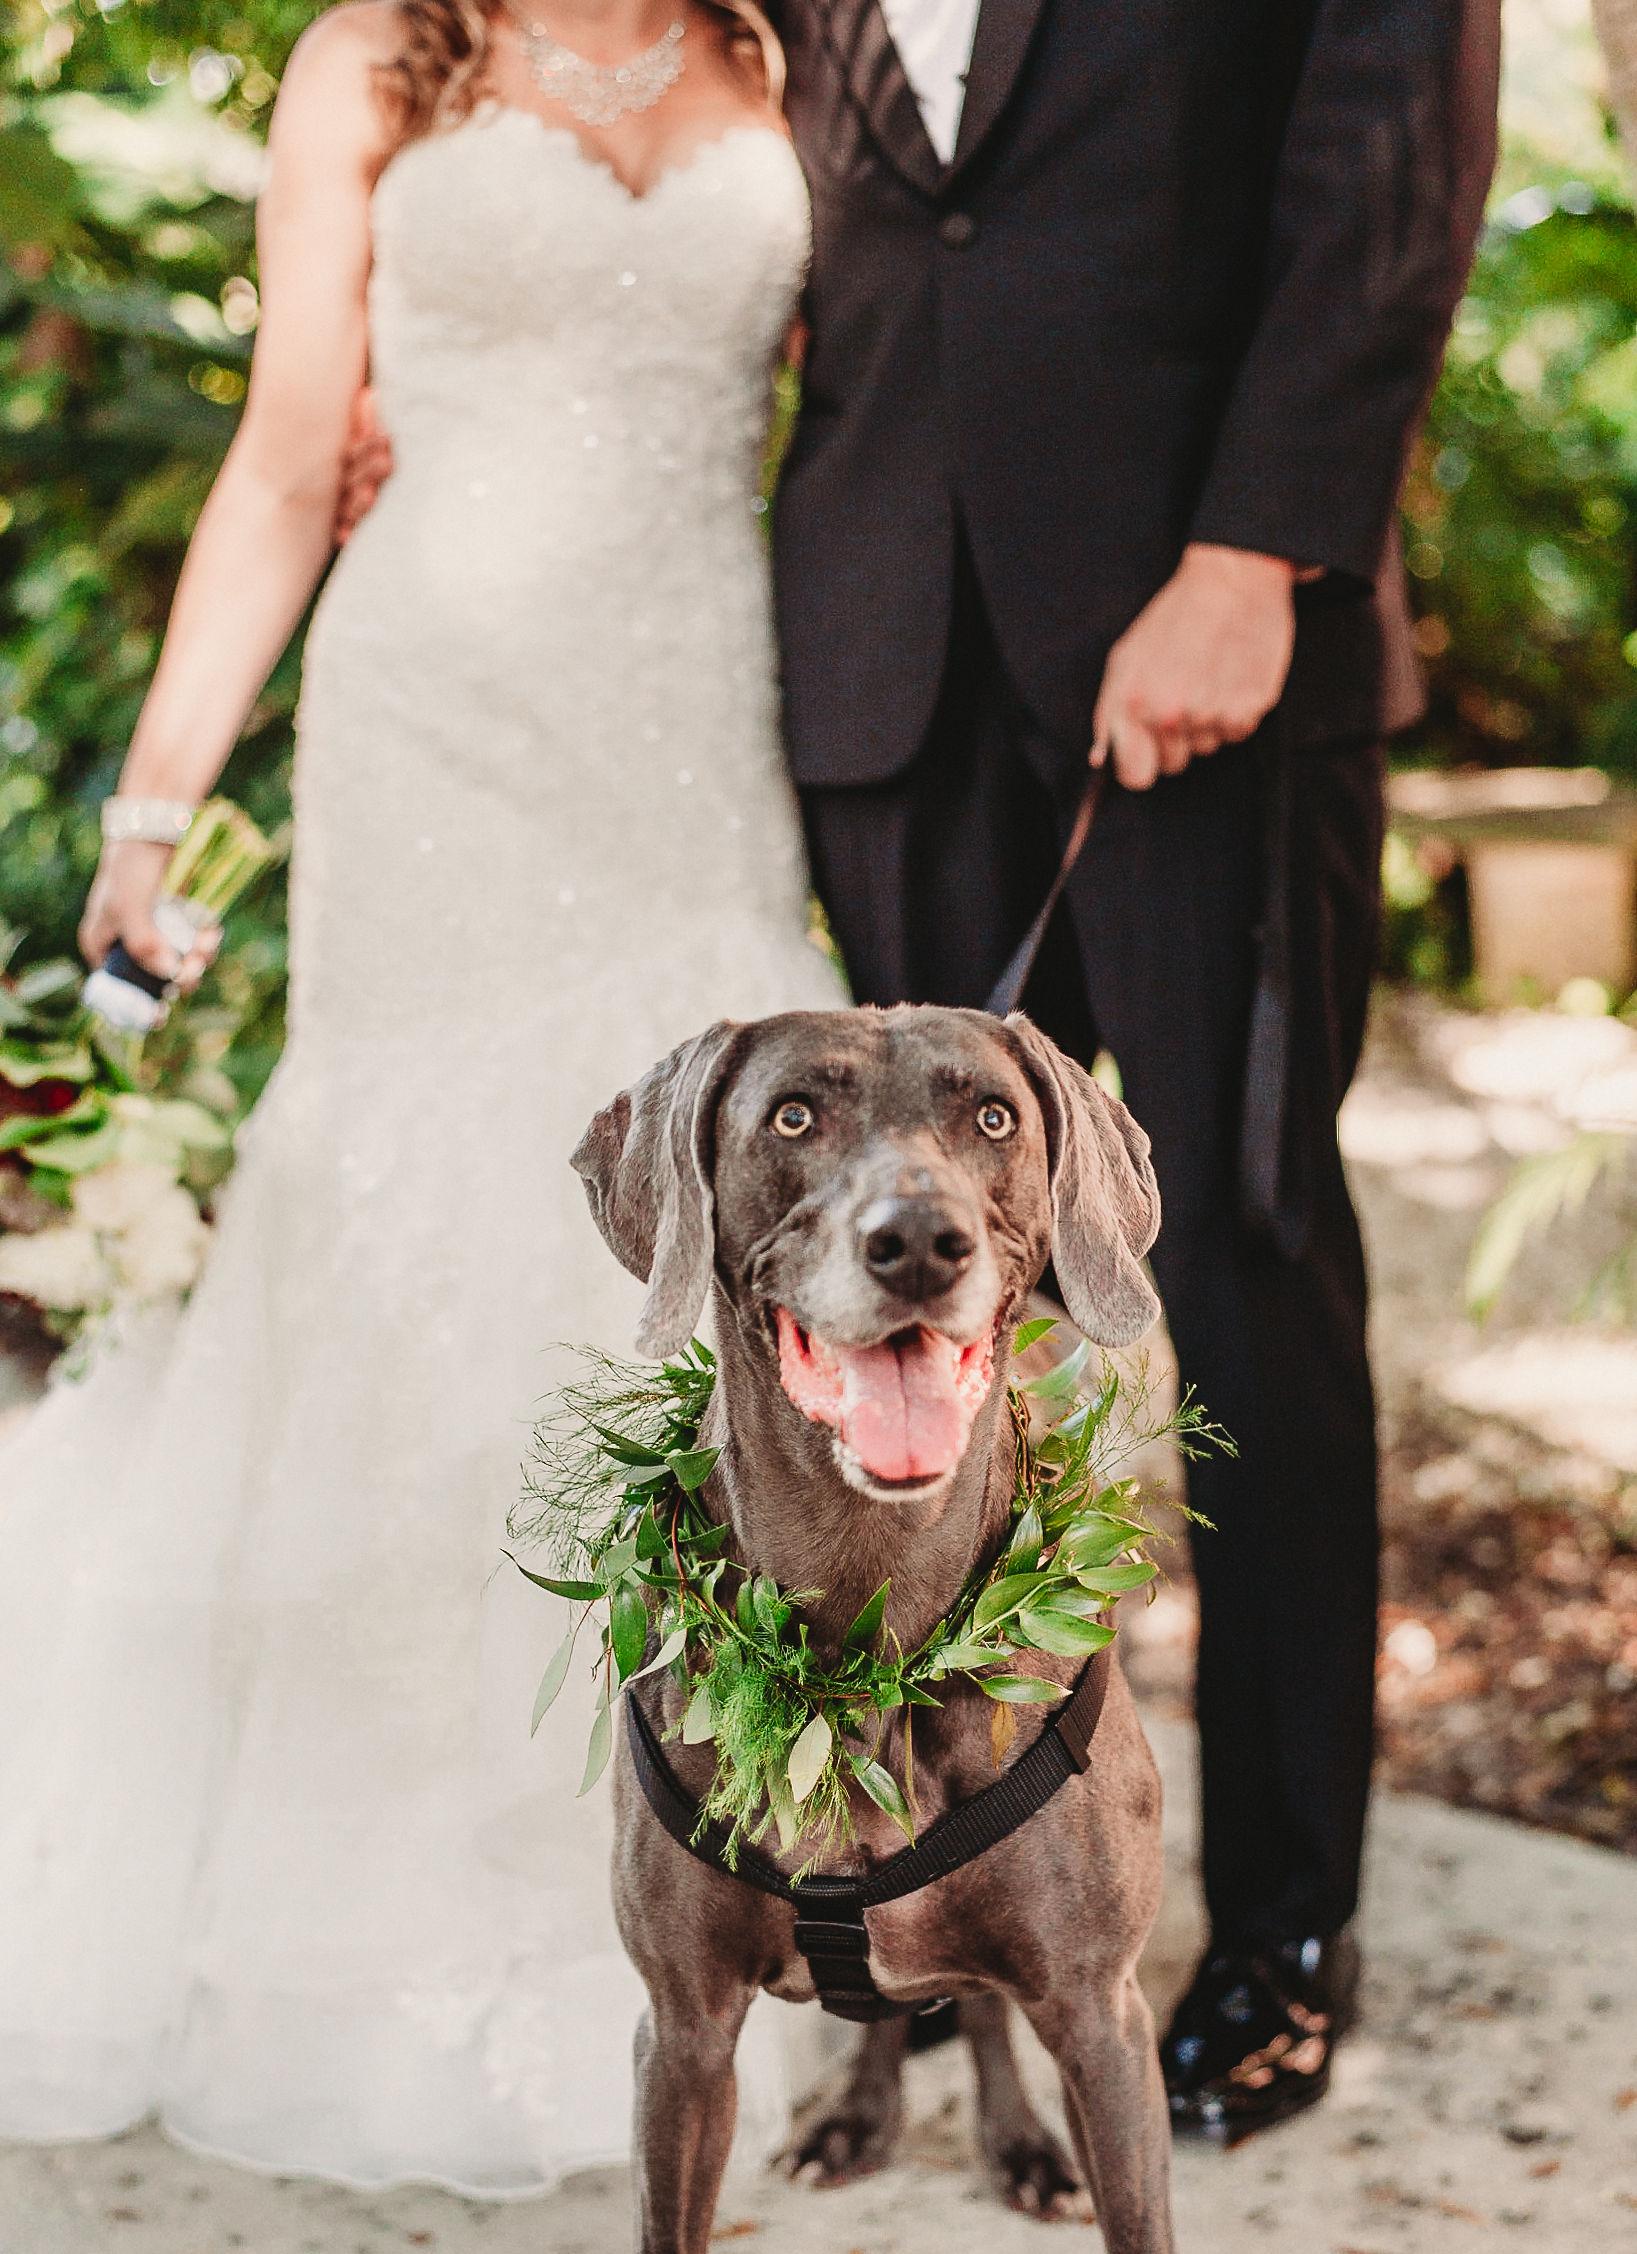 Dewitt-for-Love-Photography-M+K-Wedding-Vinoy-St-Petersburg-Tampa-Photographer-120.jpg